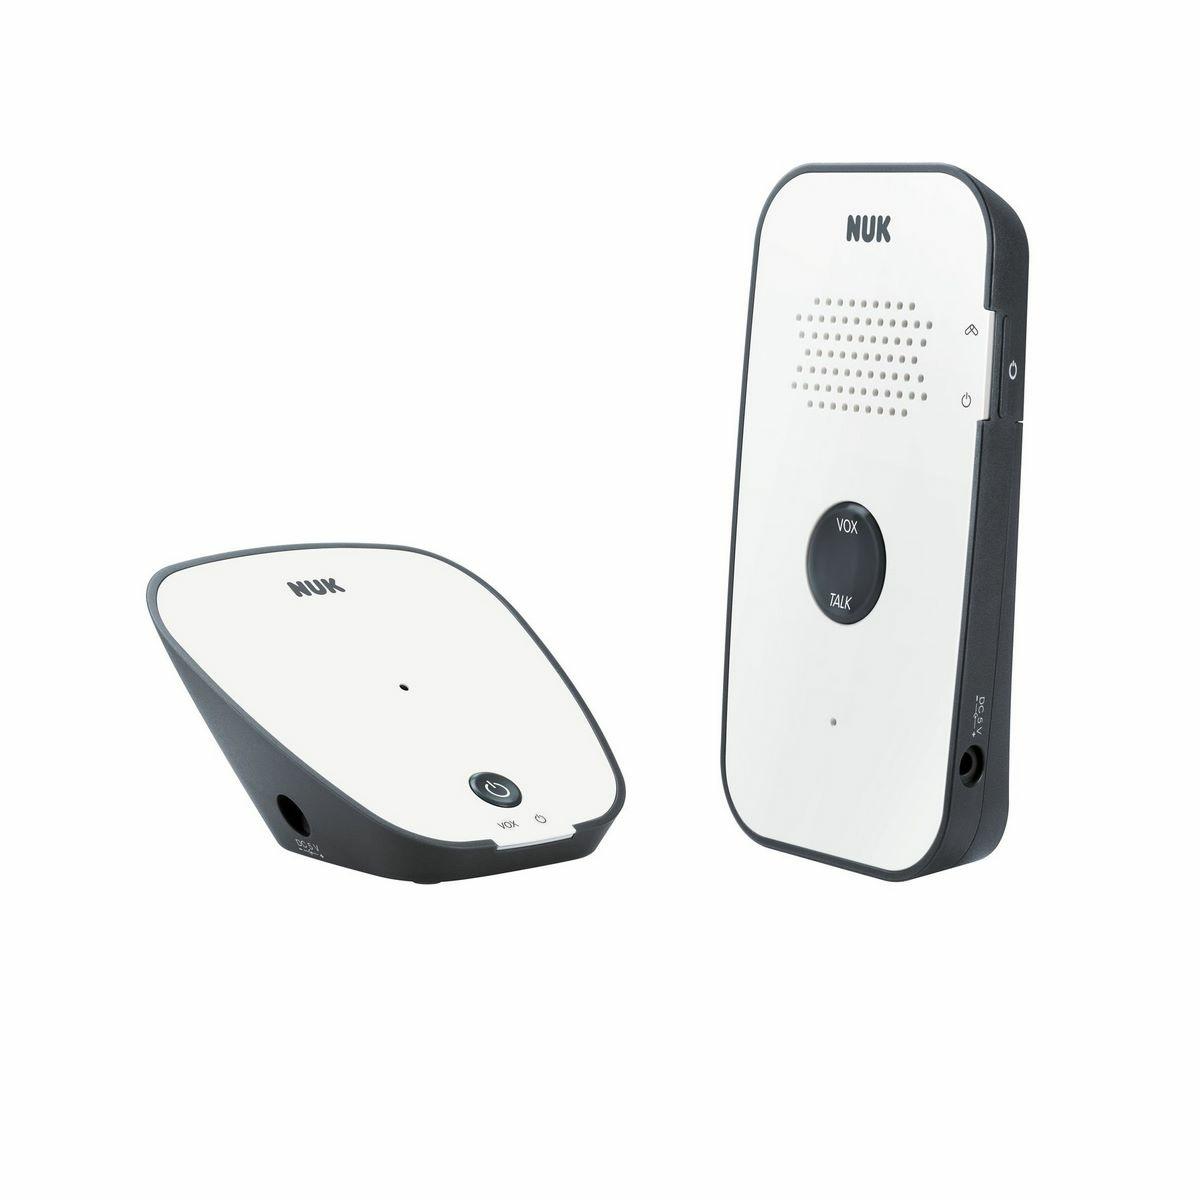 Nuk Chůvička ECO Control Audio 500